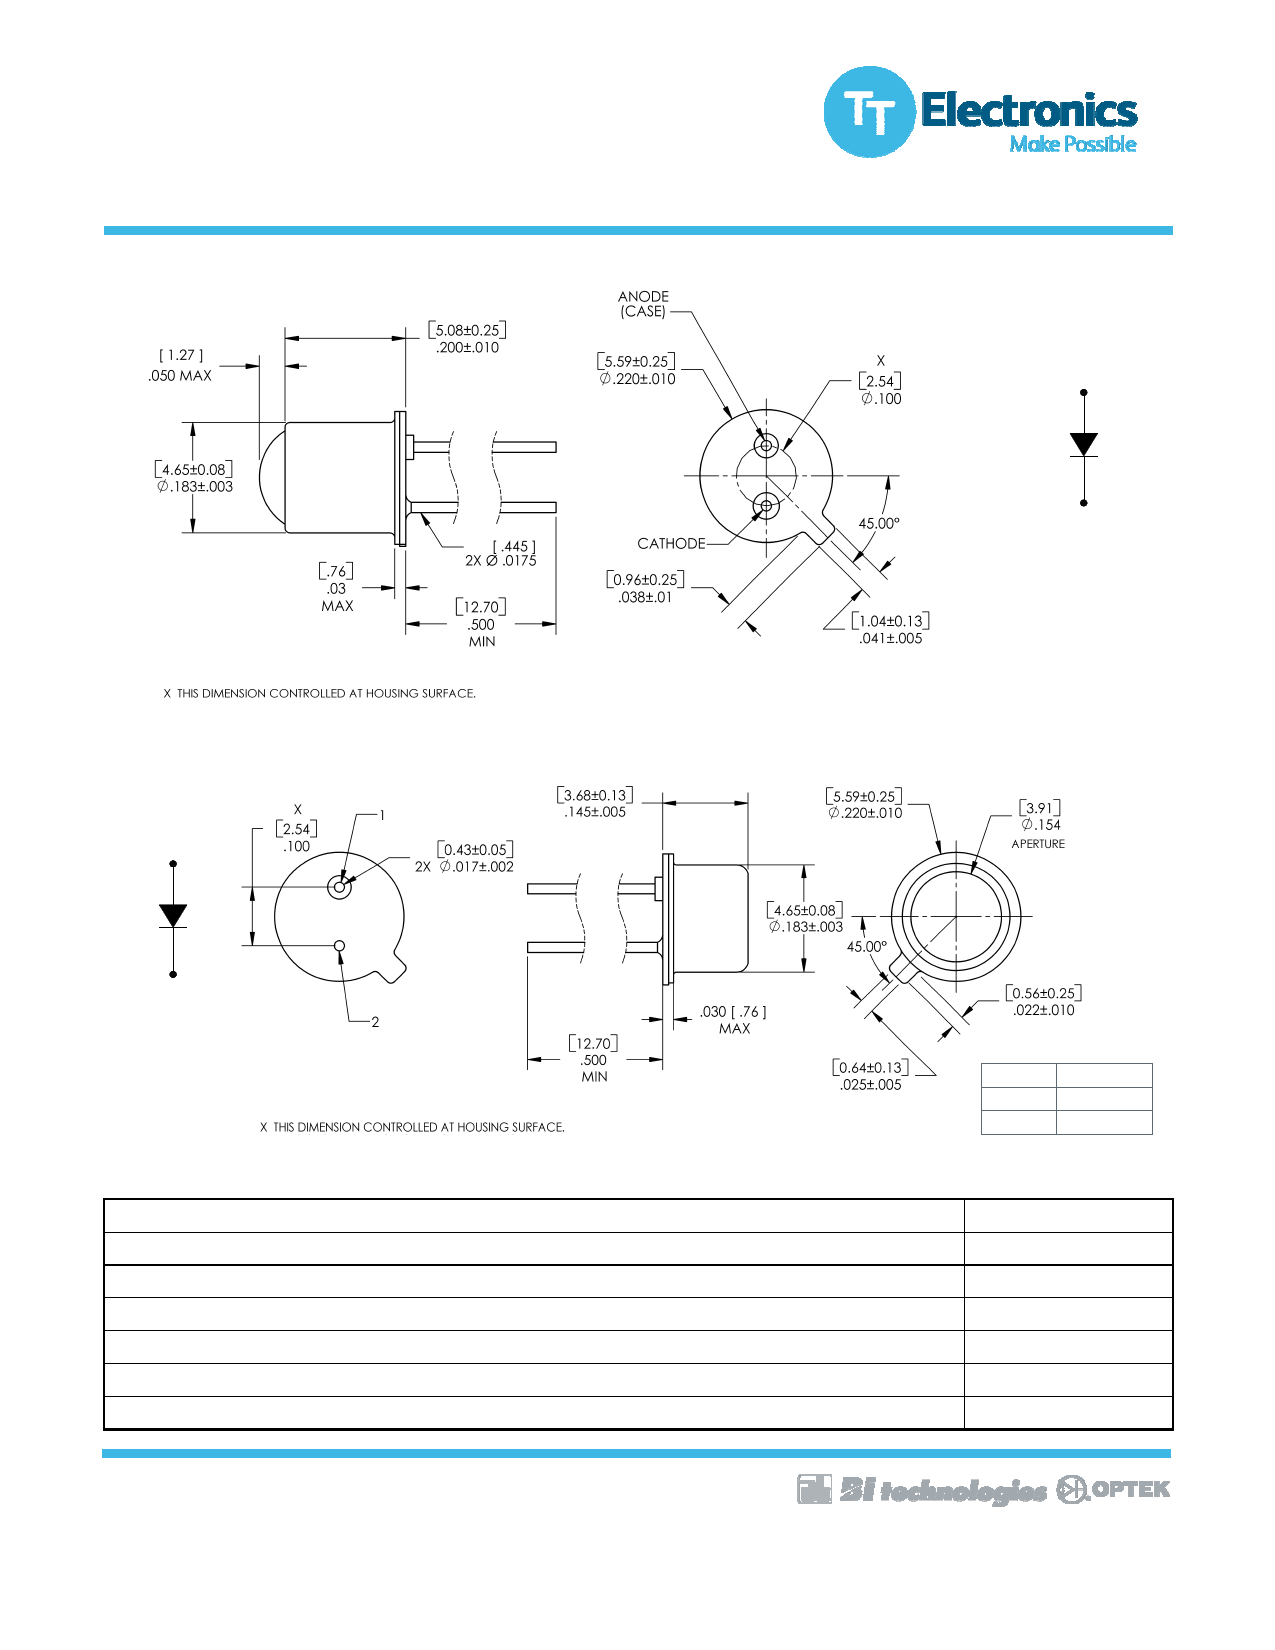 OP232W pdf, schematic